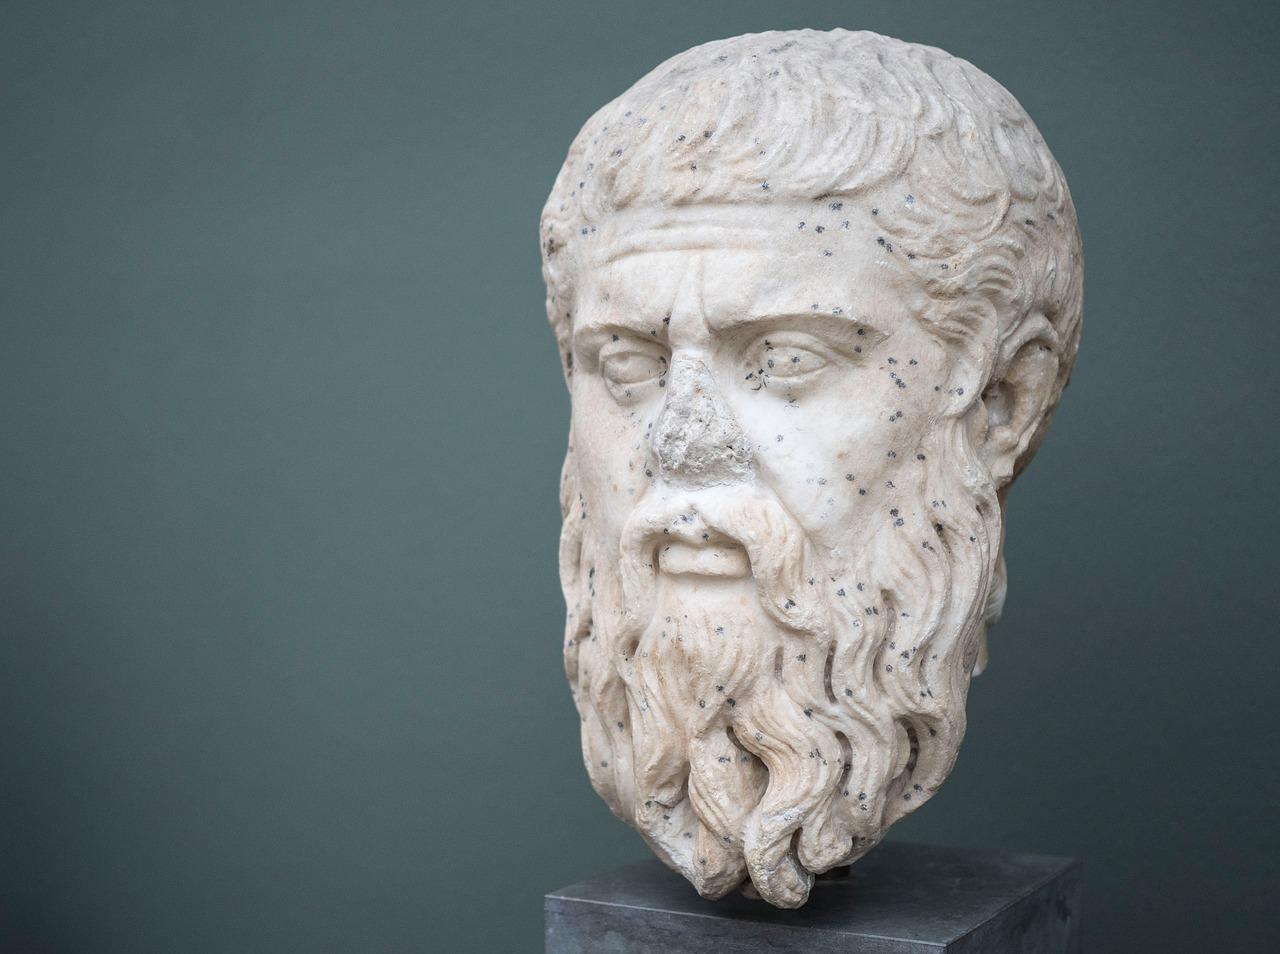 Evolution Disproves Platonism (A Hypothesis)